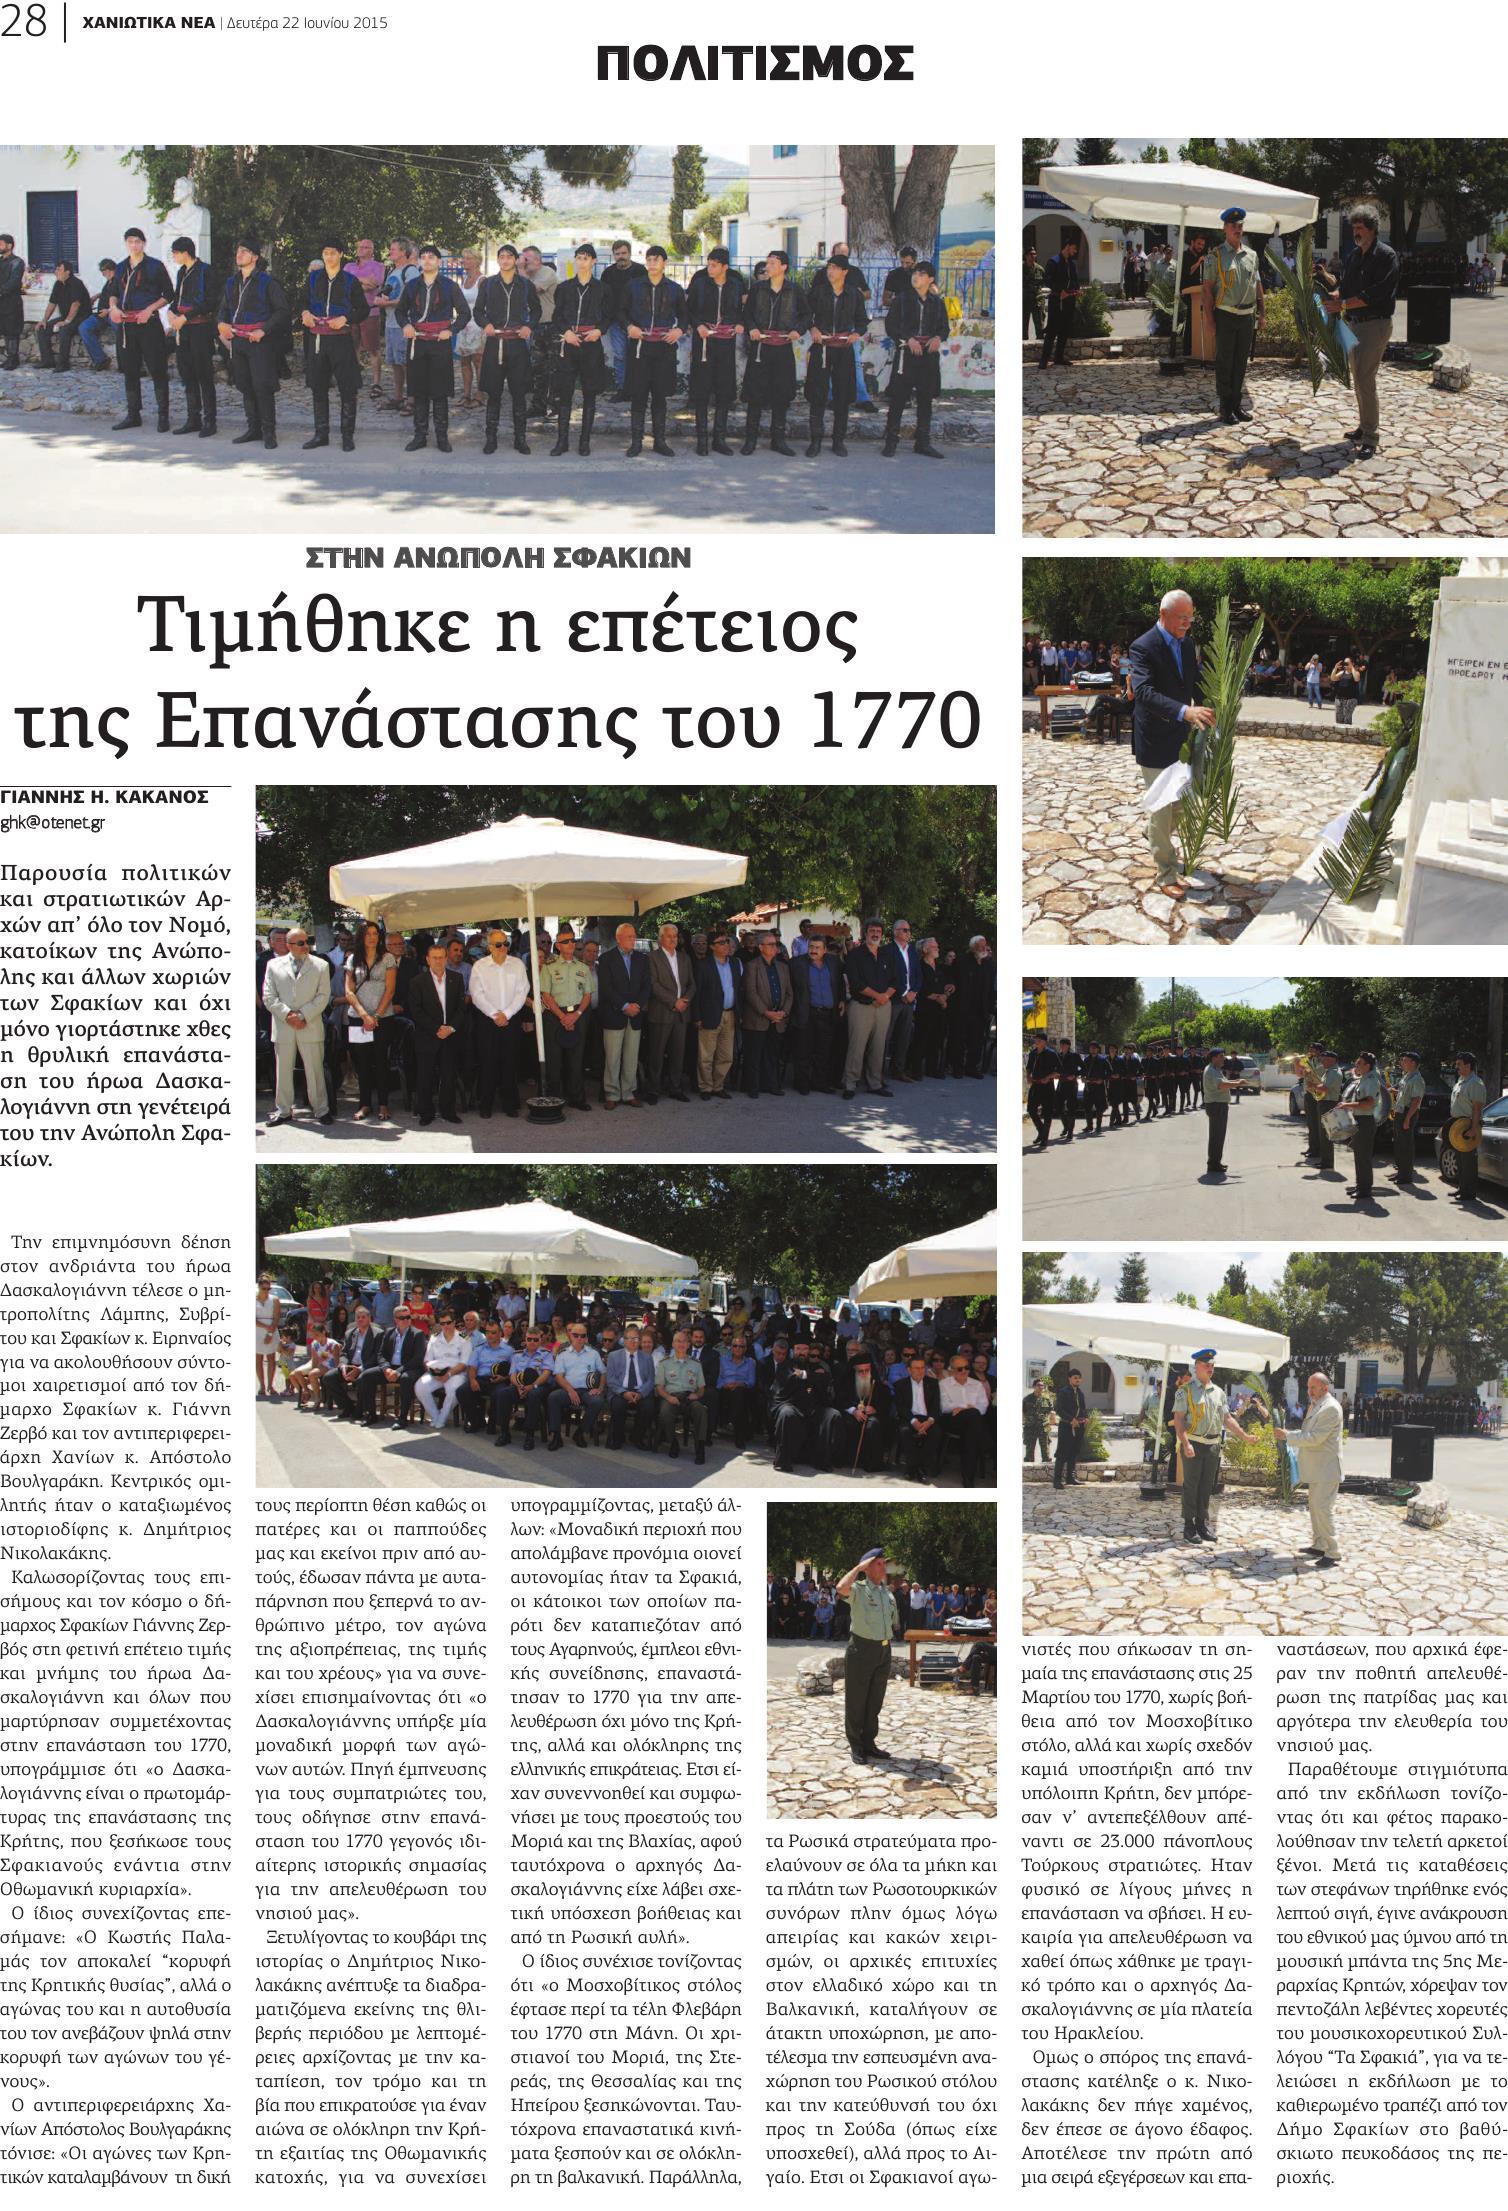 28.pdf Δασκαλογιάννης Ανώπολη